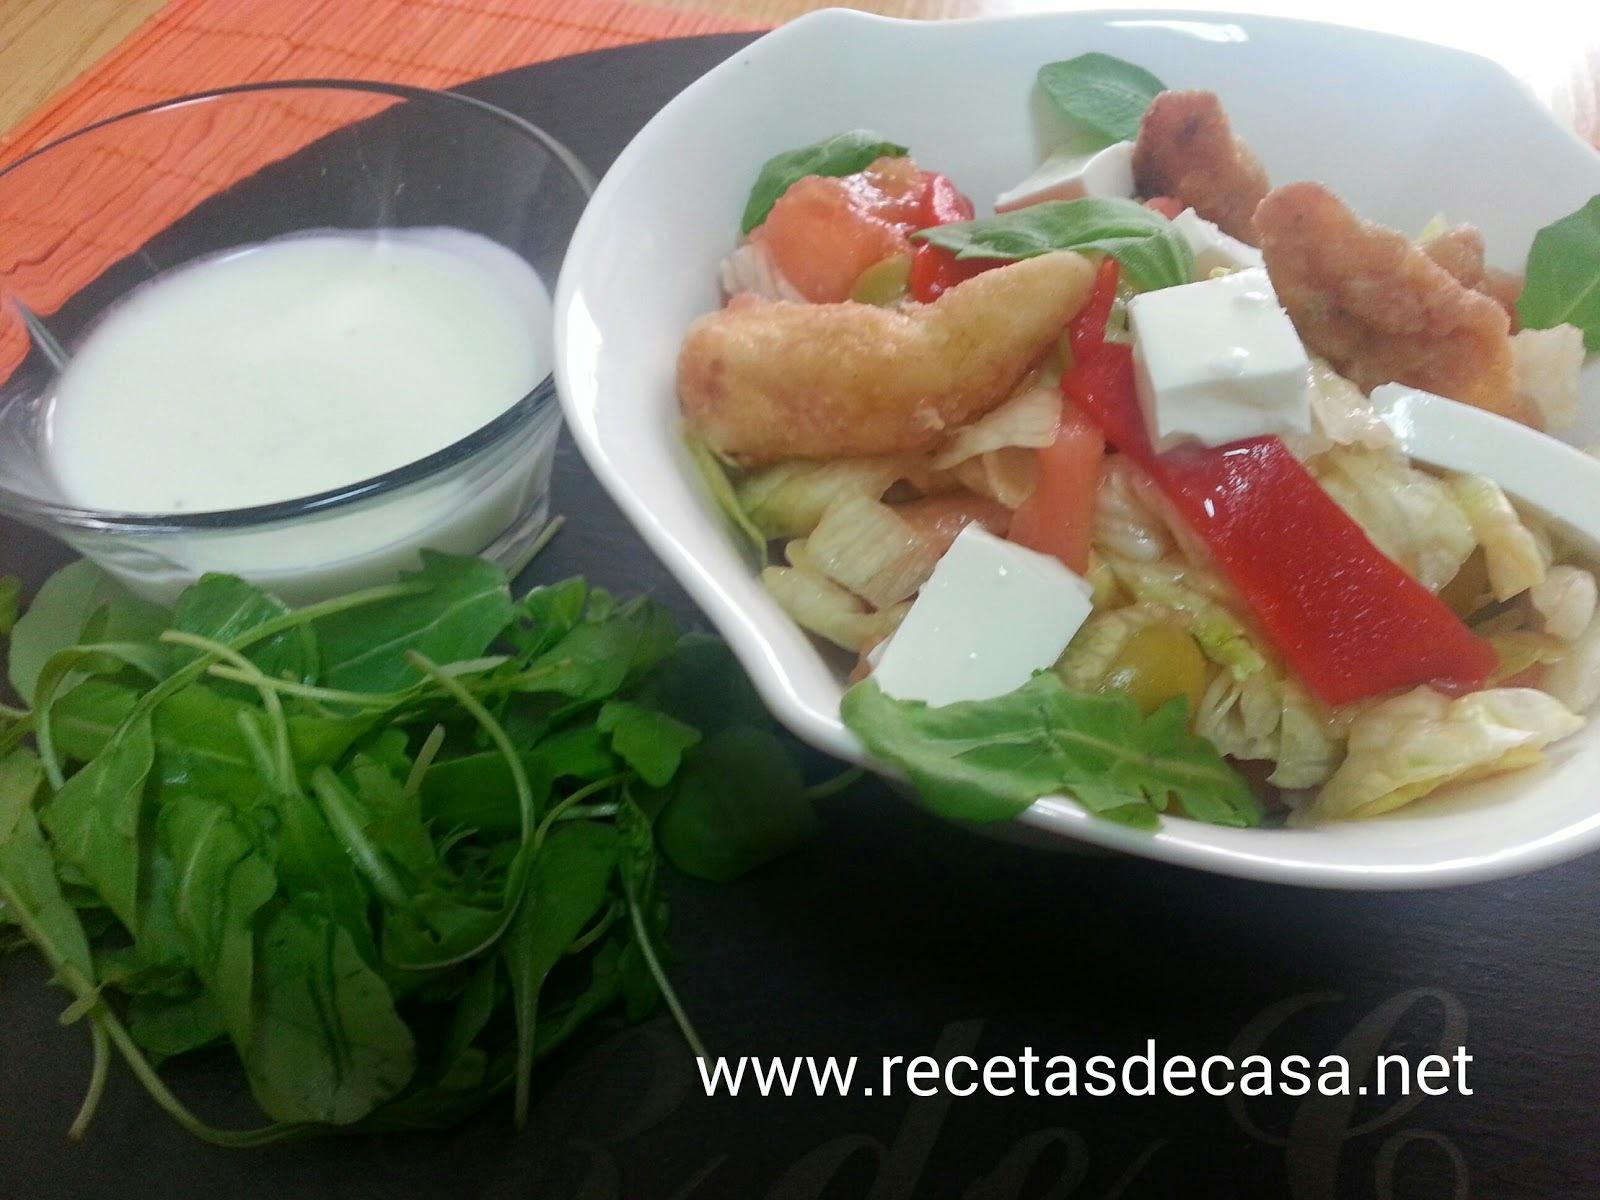 Ensalada de pollo con salsa de yogurt